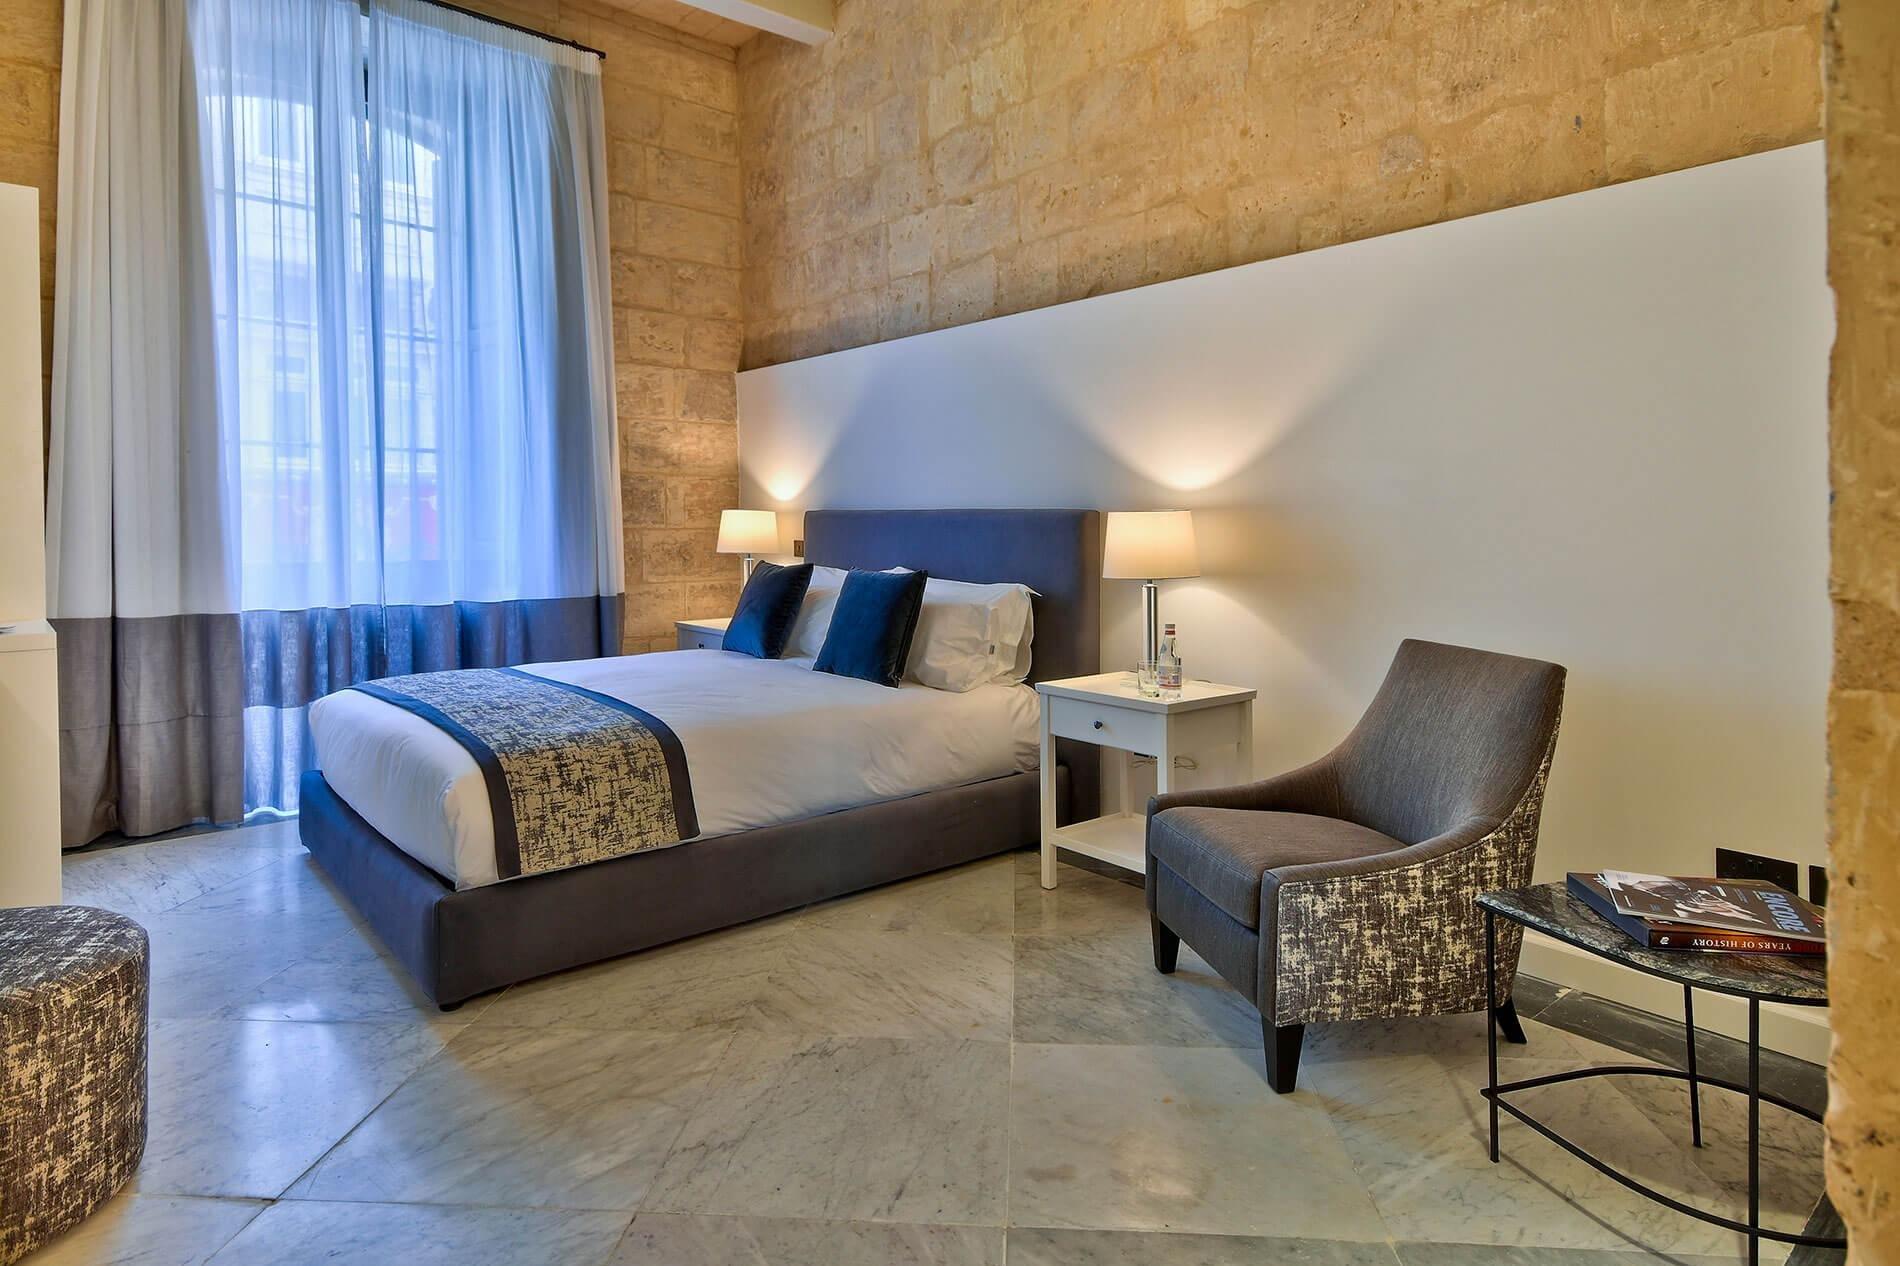 66 St. Paul's Hotel & Spa luxe kamer stadszicht - Valletta